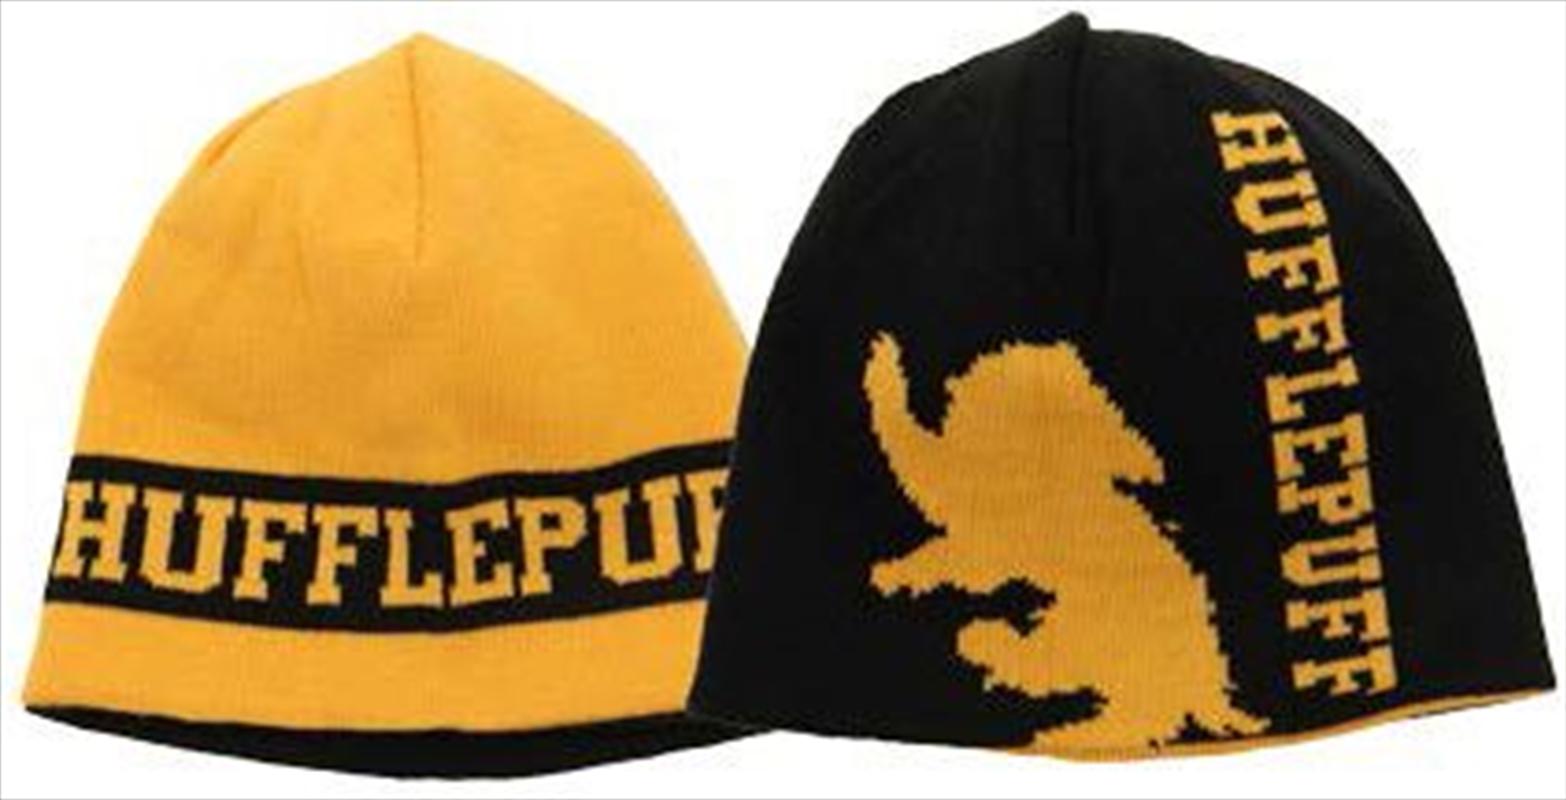 Hufflepuff Knit Beanie   Merchandise